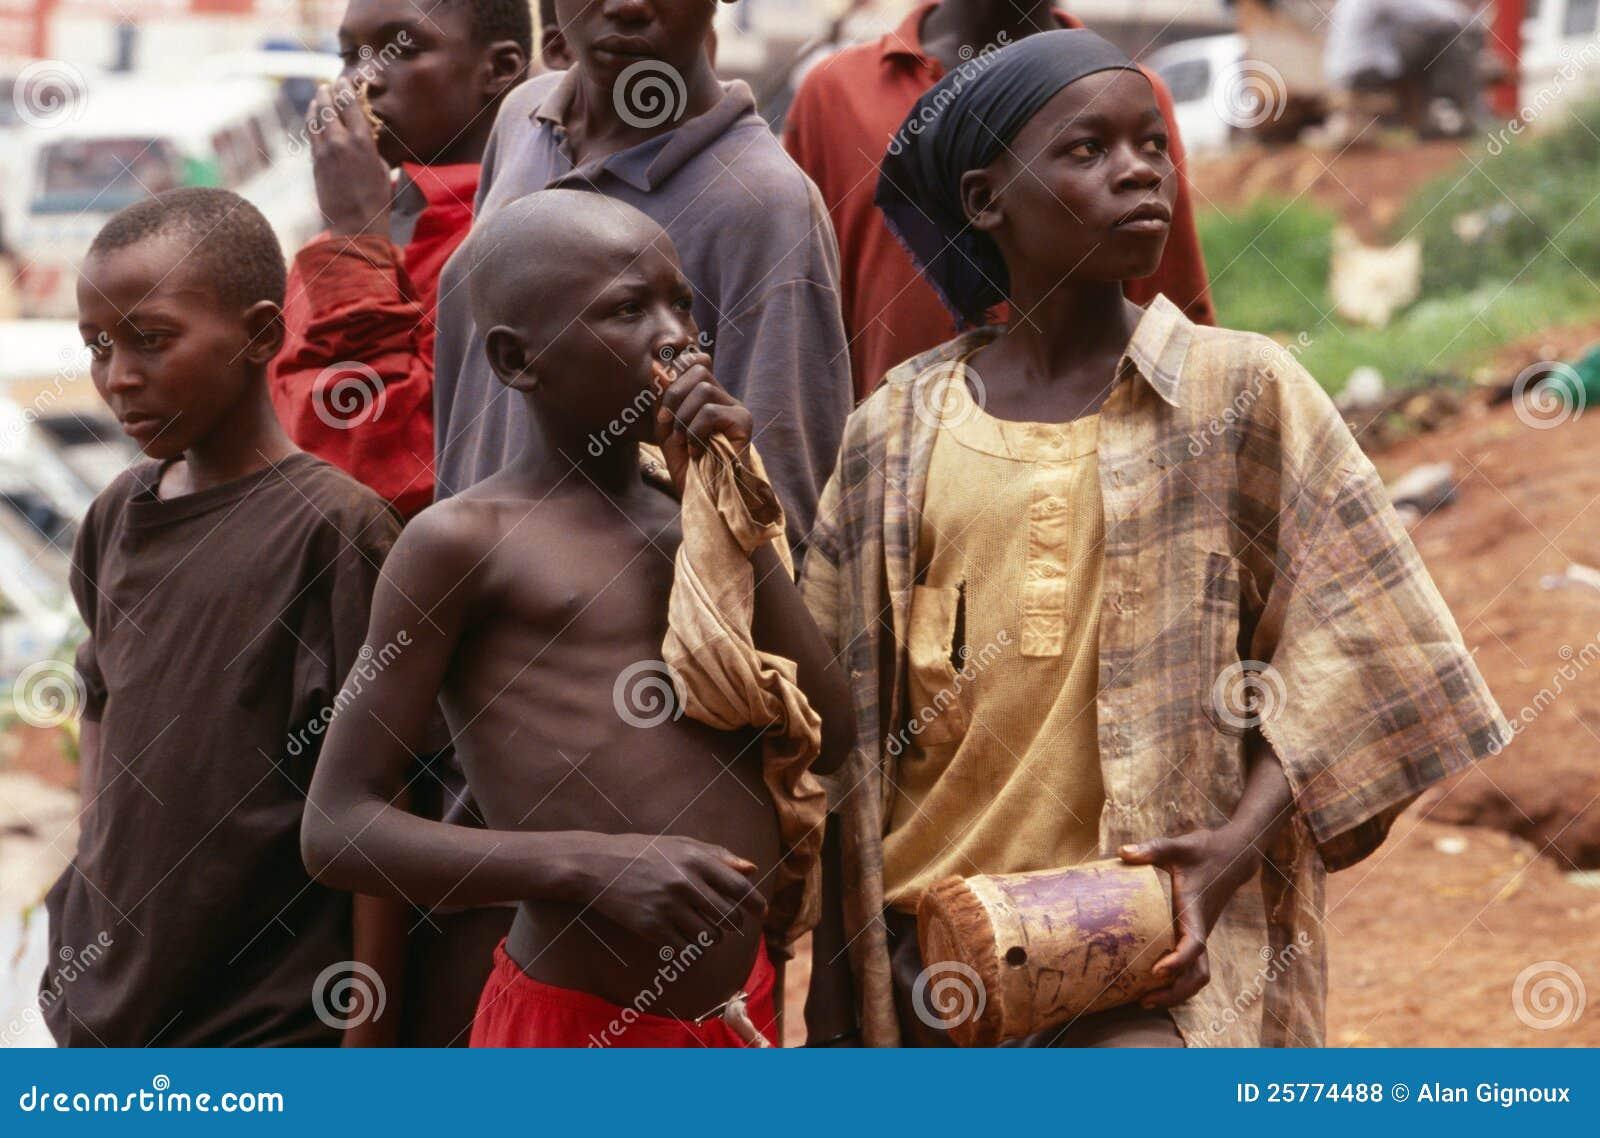 Jeunes colle-renifleurs sans abri, Kampala, Ouganda